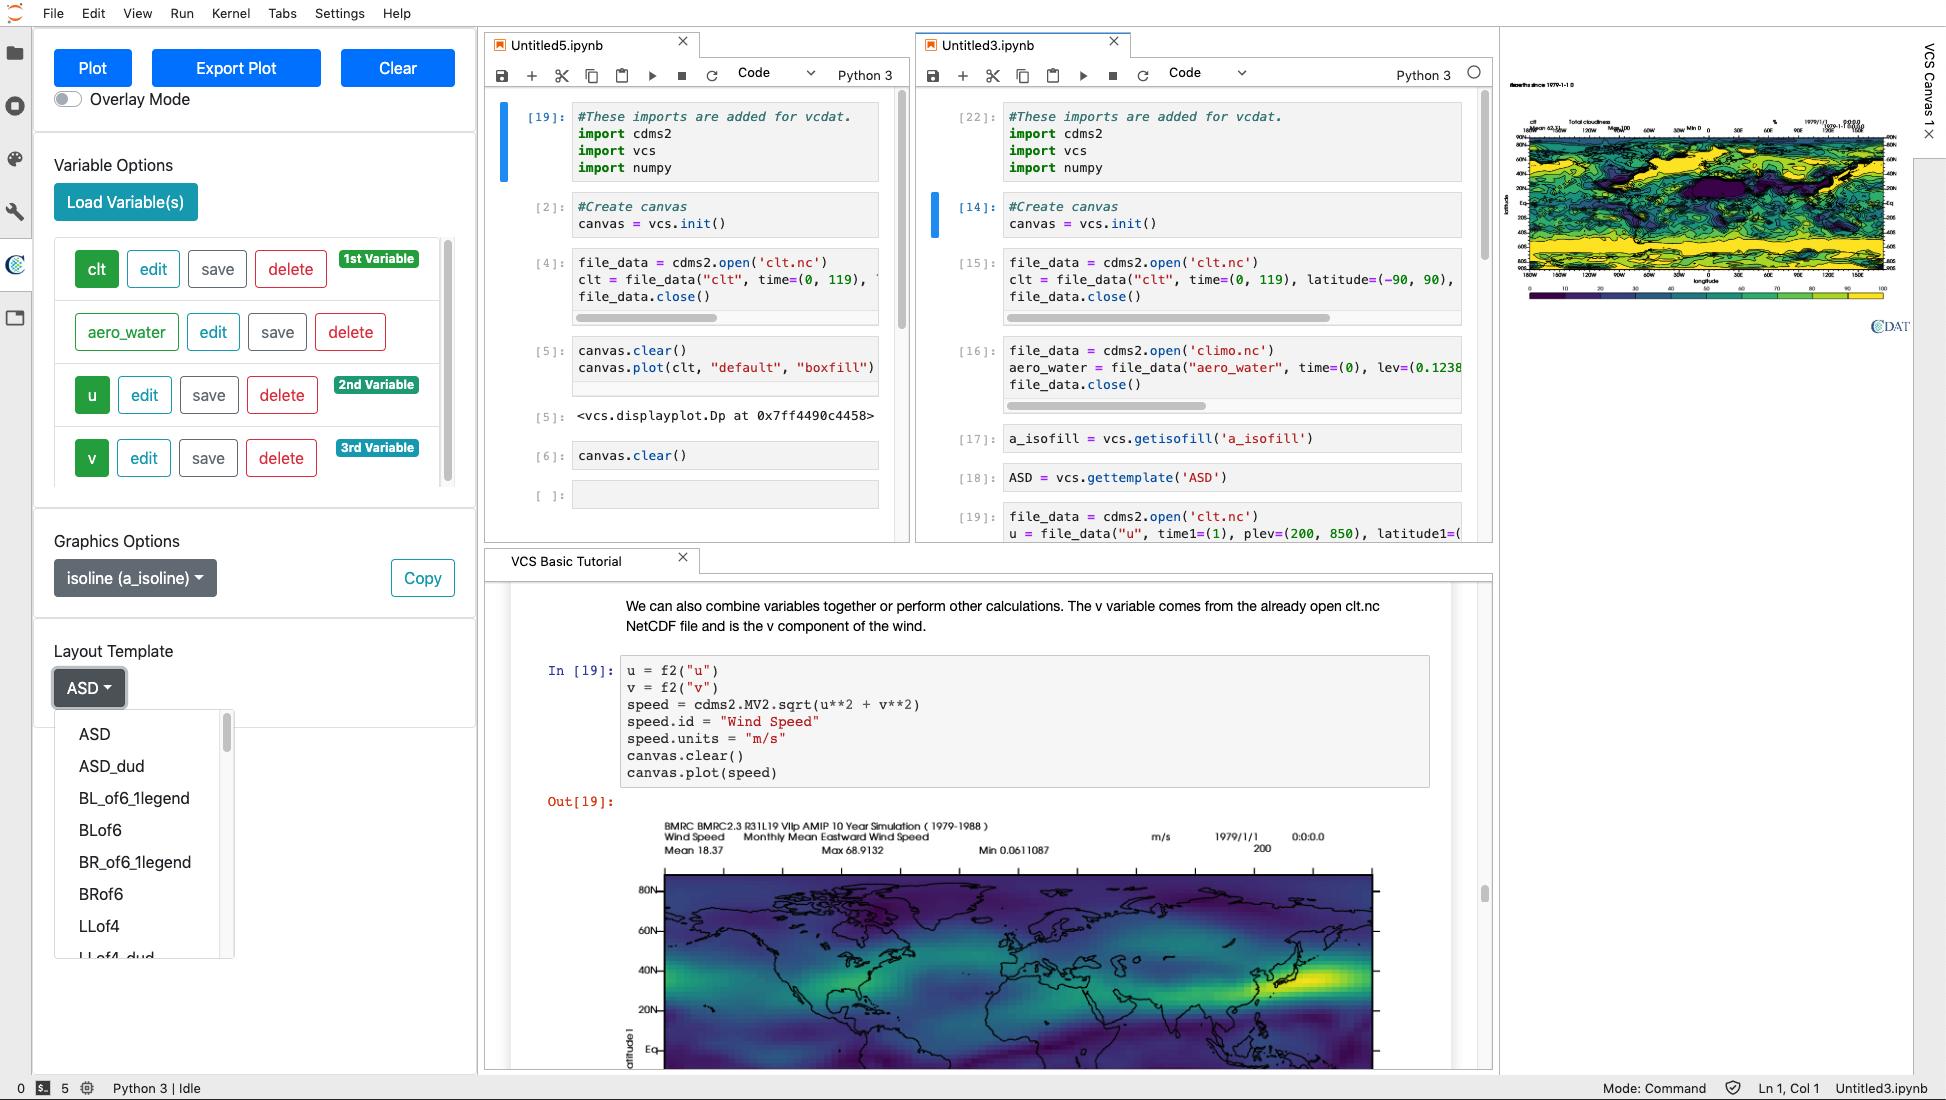 VCDAT screenshot with multiple notebooks open